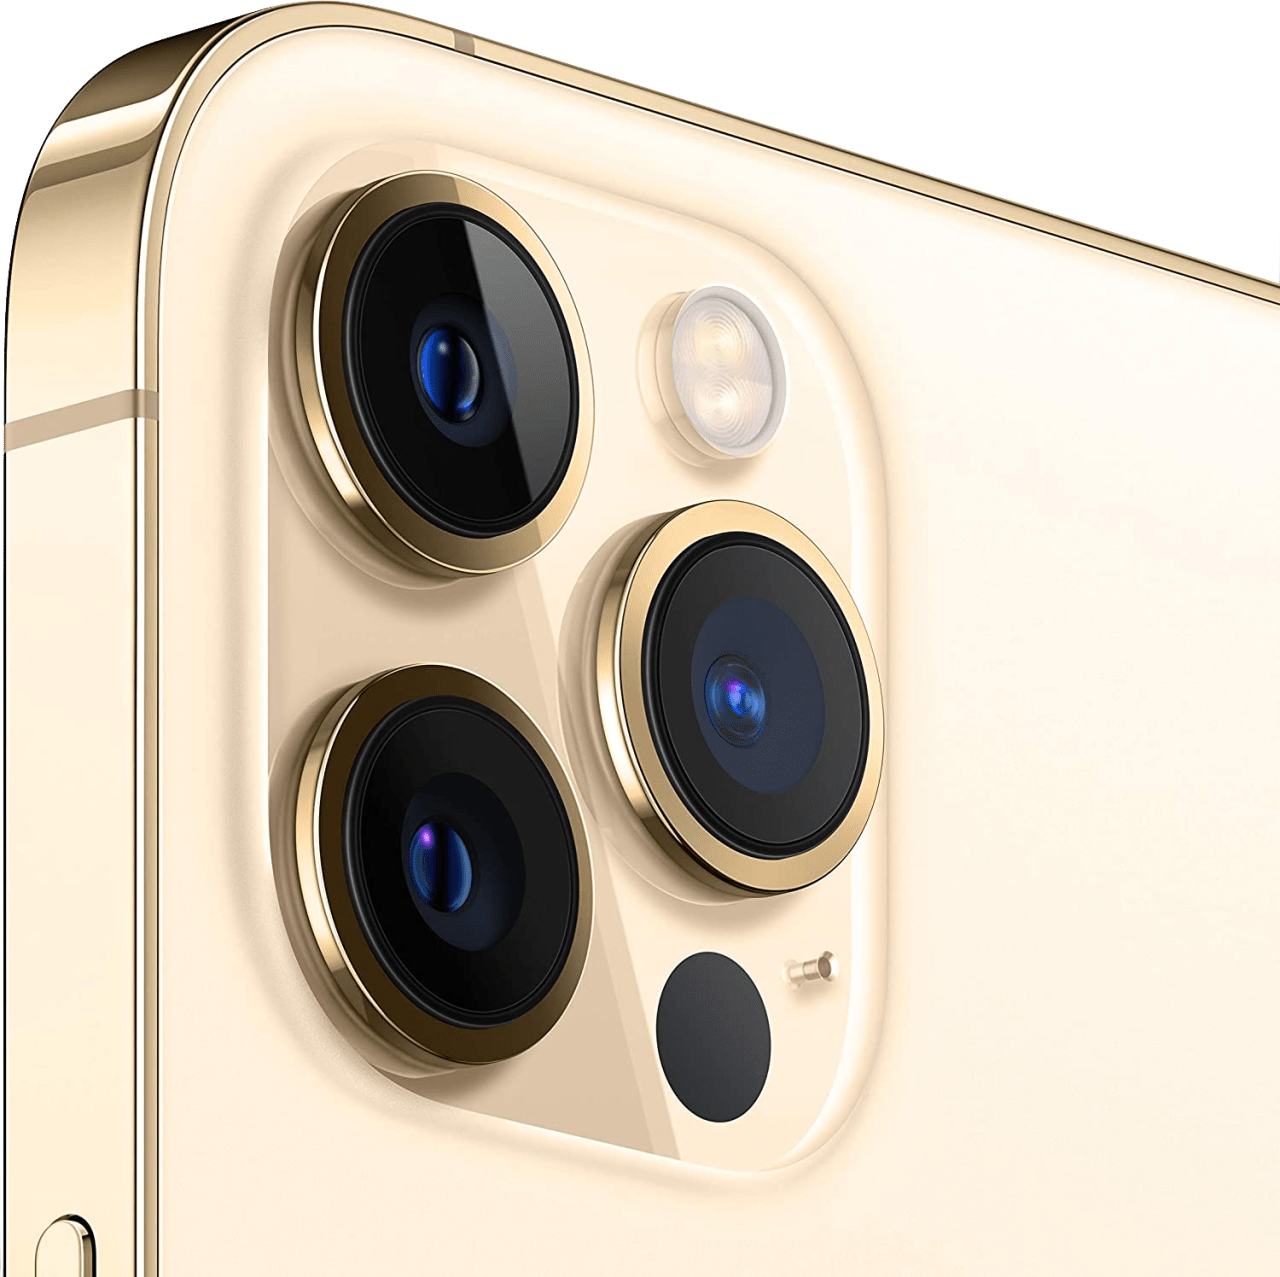 Gold Apple iPhone 12 Pro Max 128GB.2